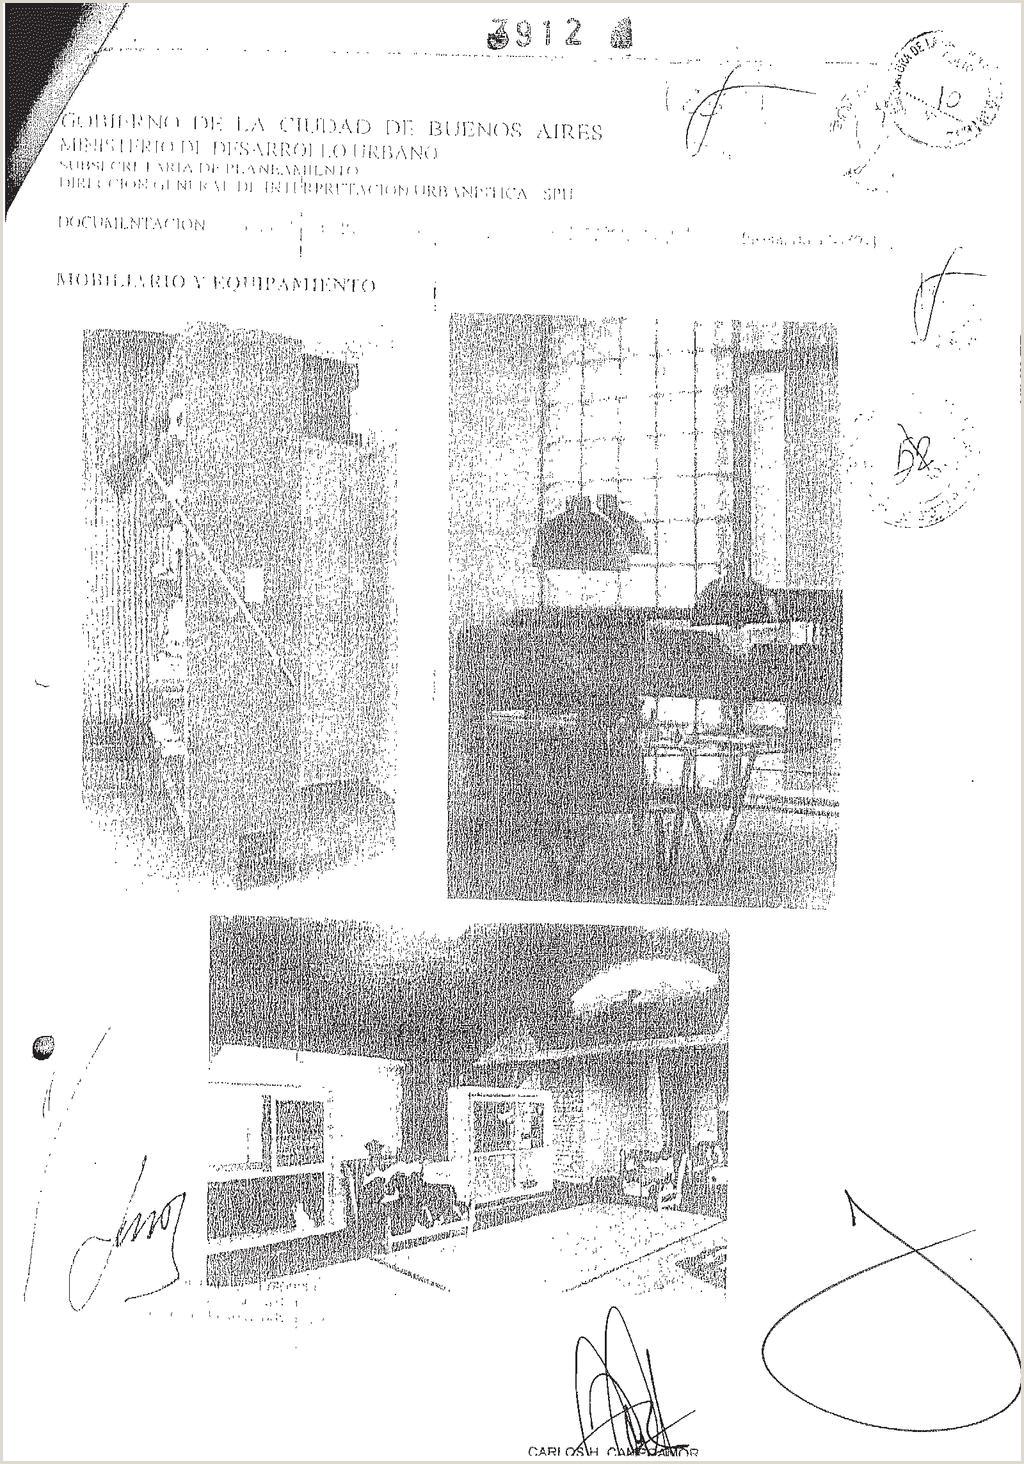 ANEXOS DEL BOLETN OFICIAL N PDF